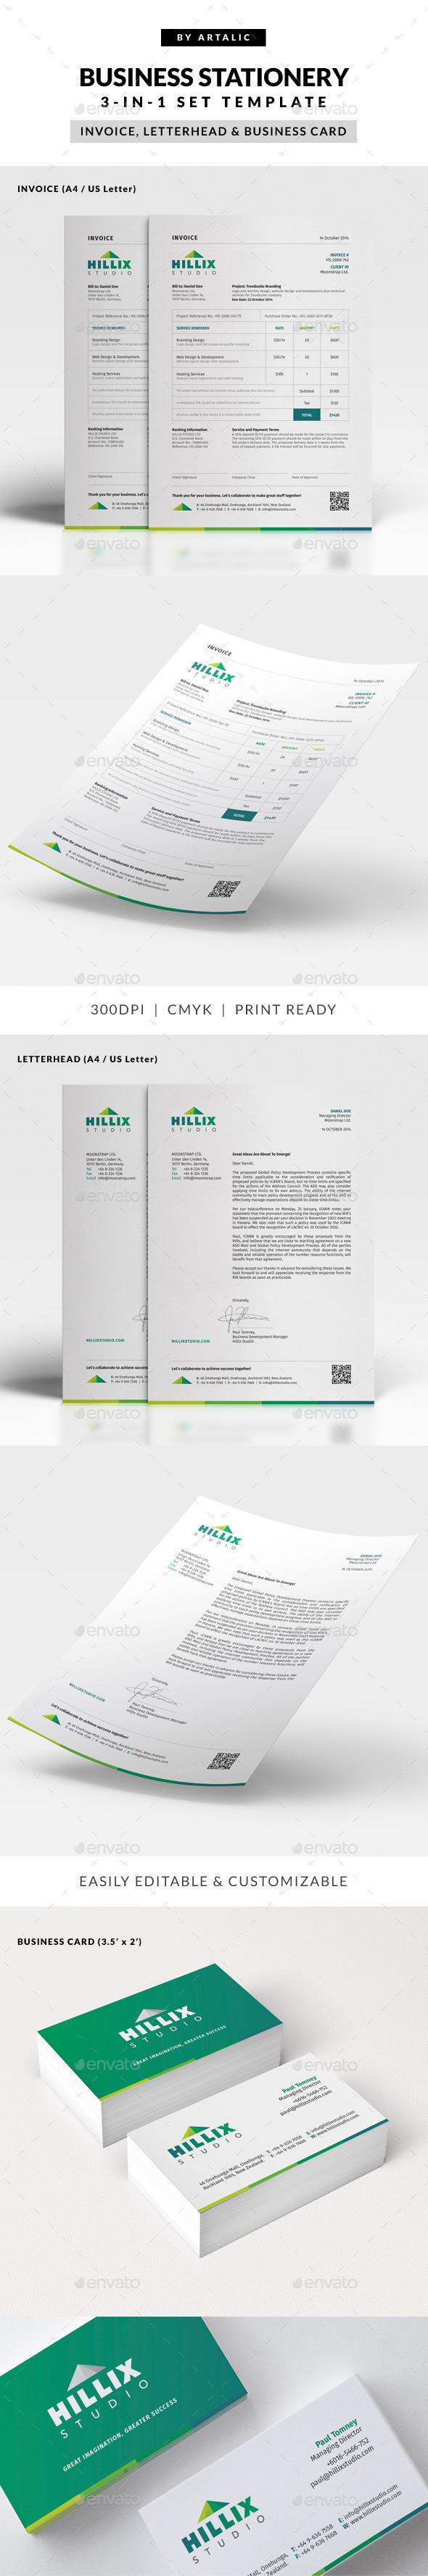 Invoice, Letterhead & Business Card Set - Stationery Print Templates